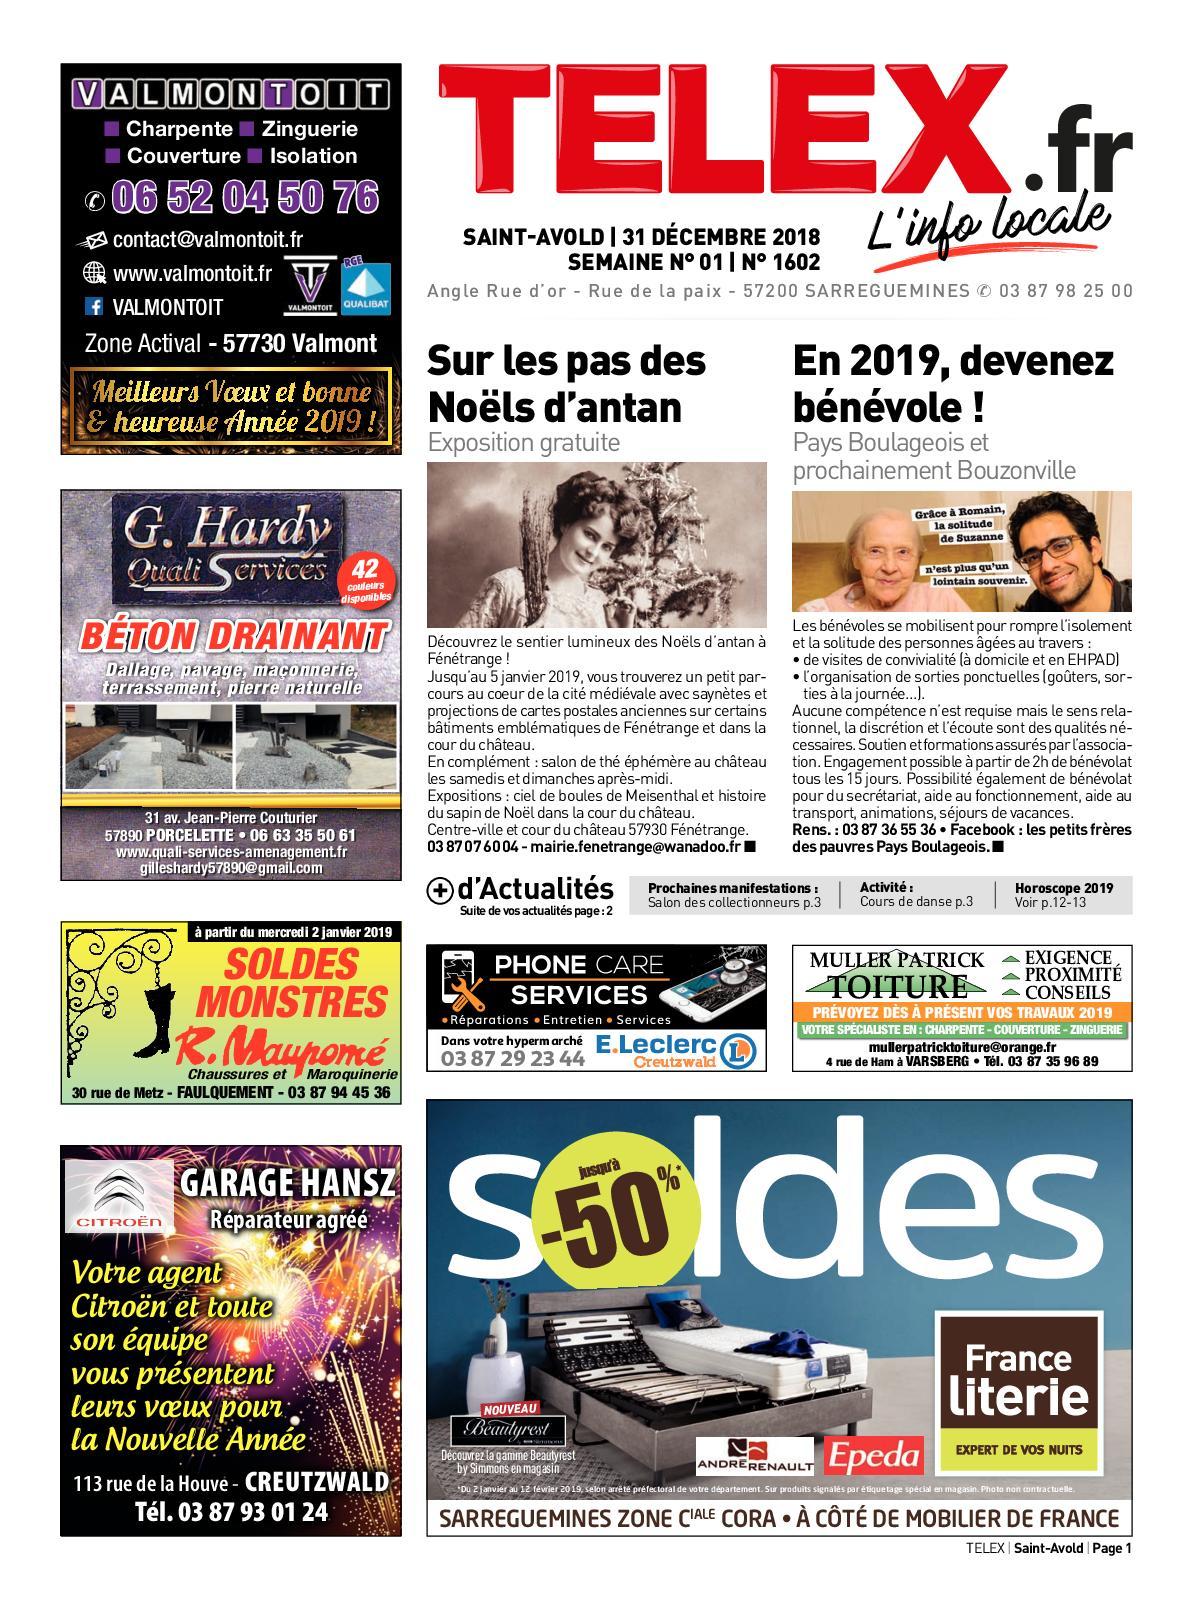 Betting les saint avold mairie de bordeaux betting bangarraju movie online megavideo